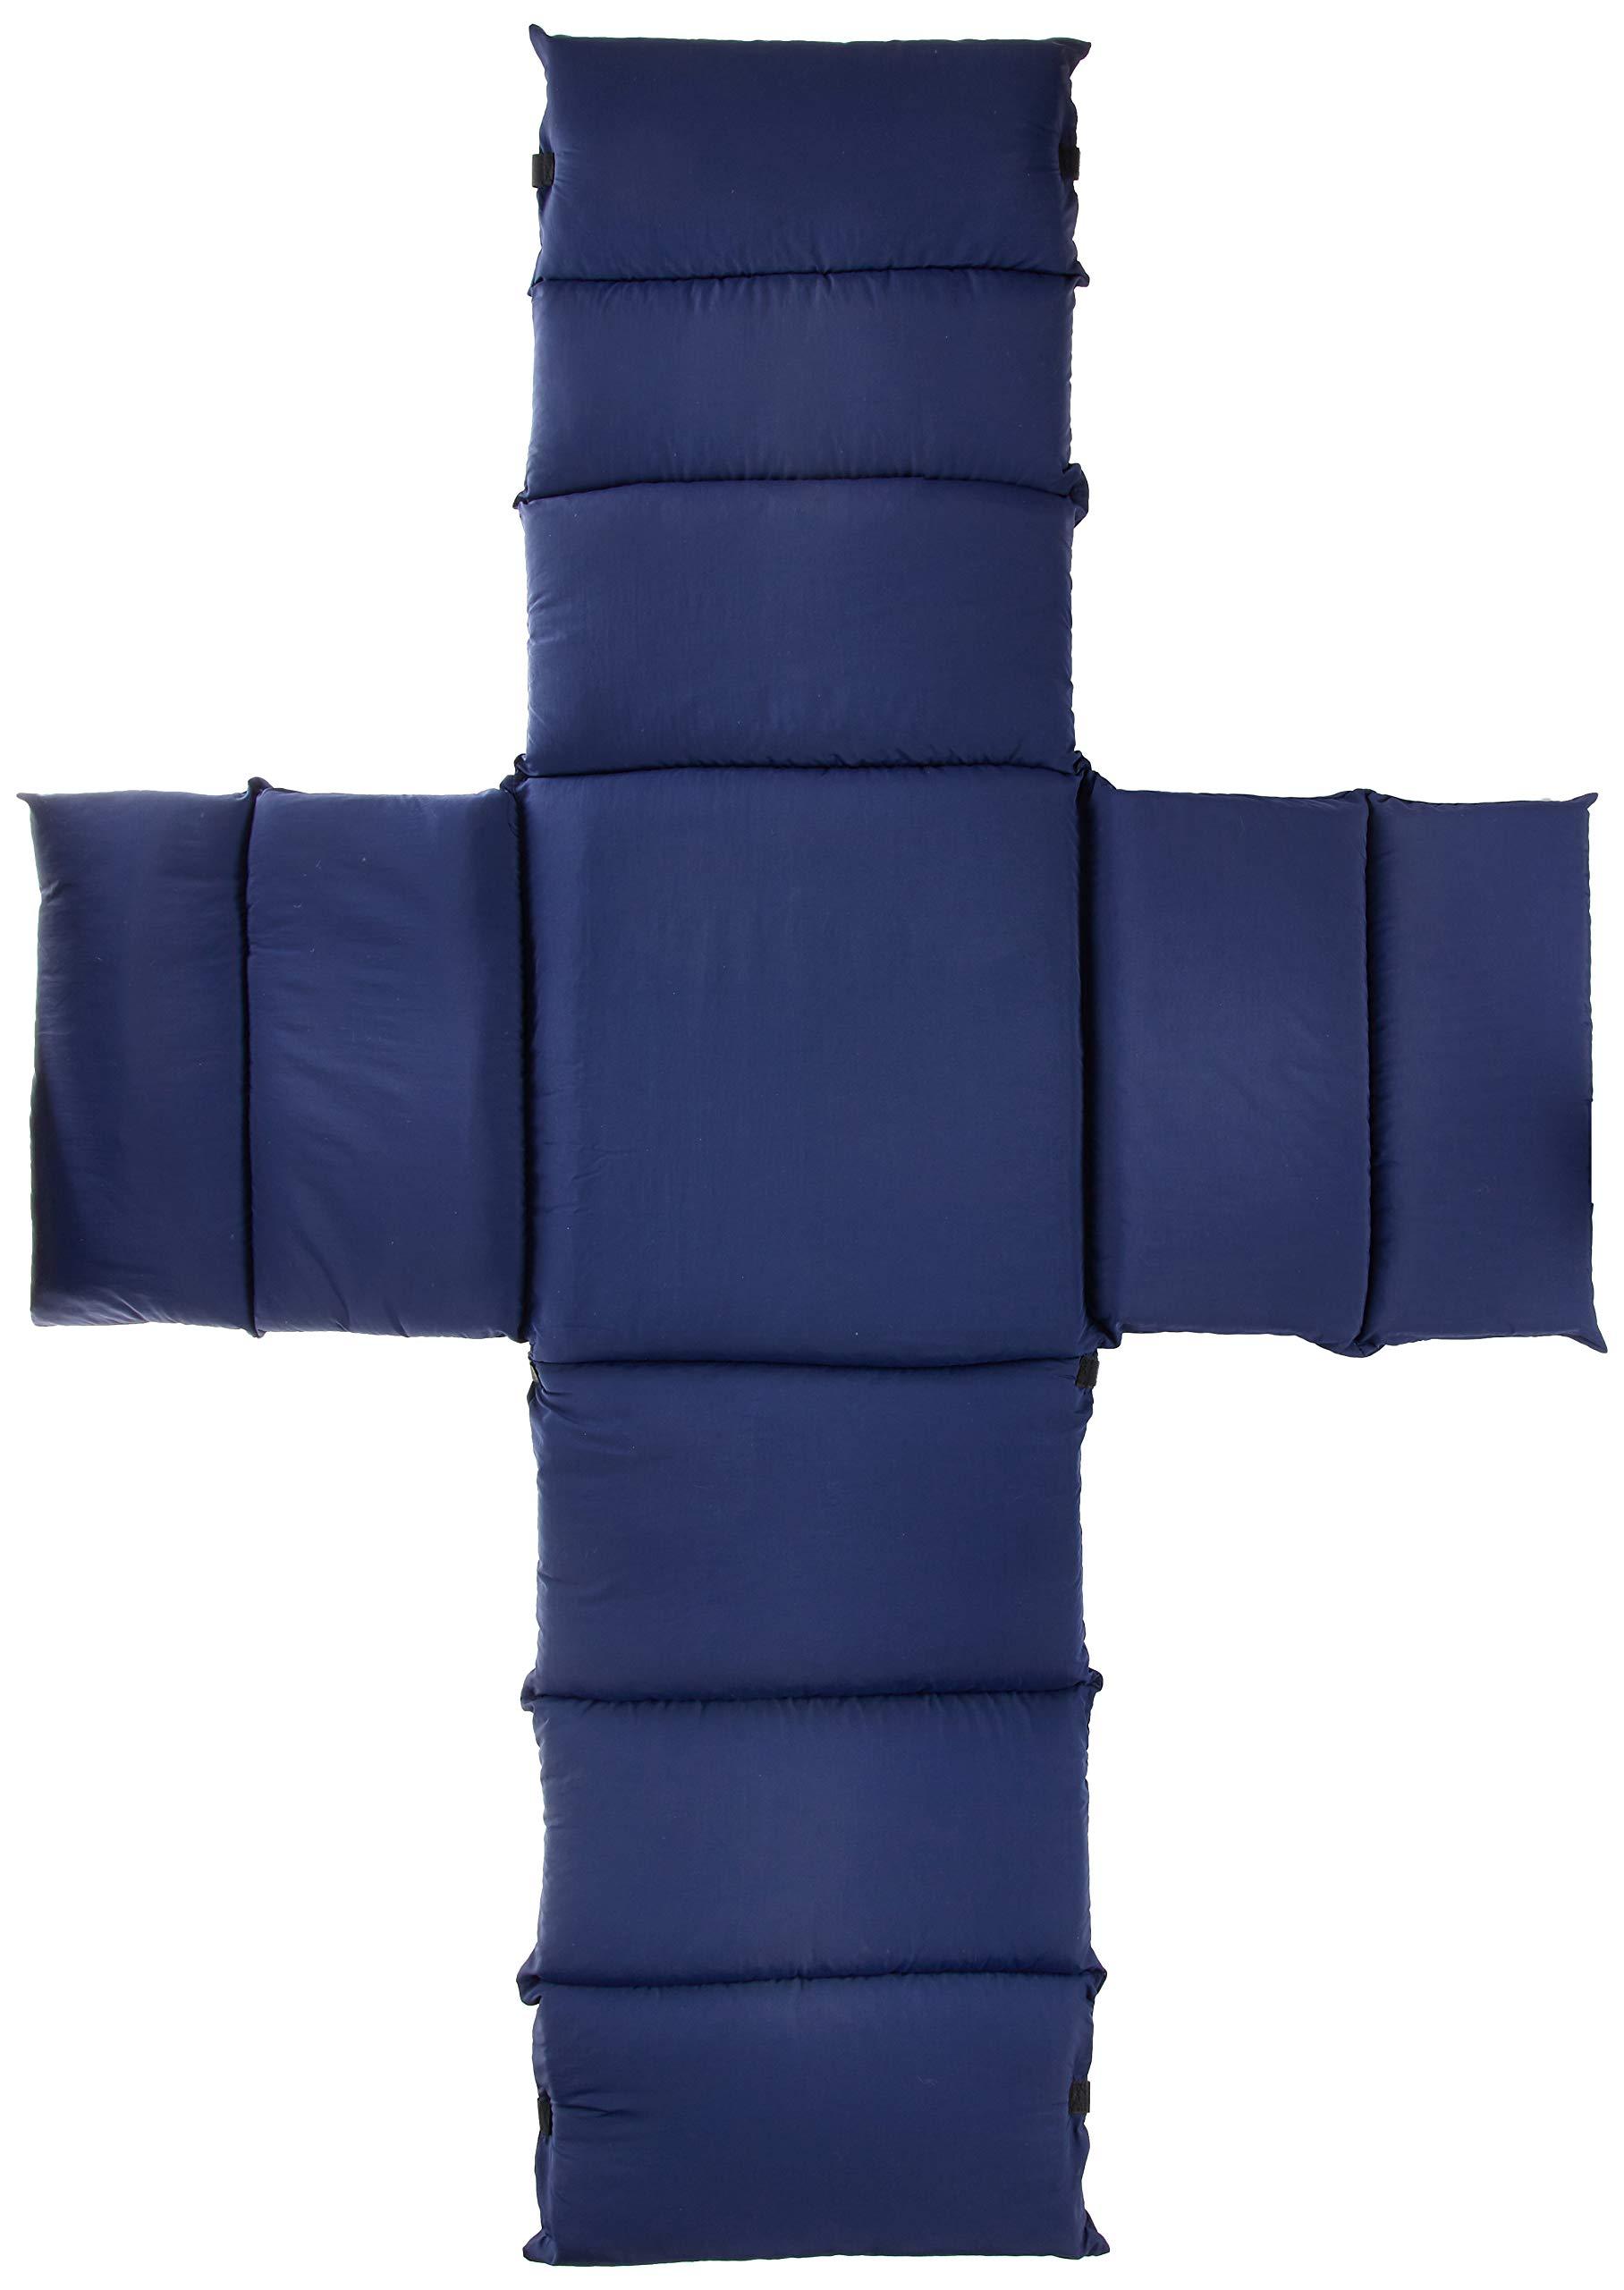 New York Orthopedic Usa Water, Resistant Geri Chair Overlay, Nyu9520Gc, 1 Pound